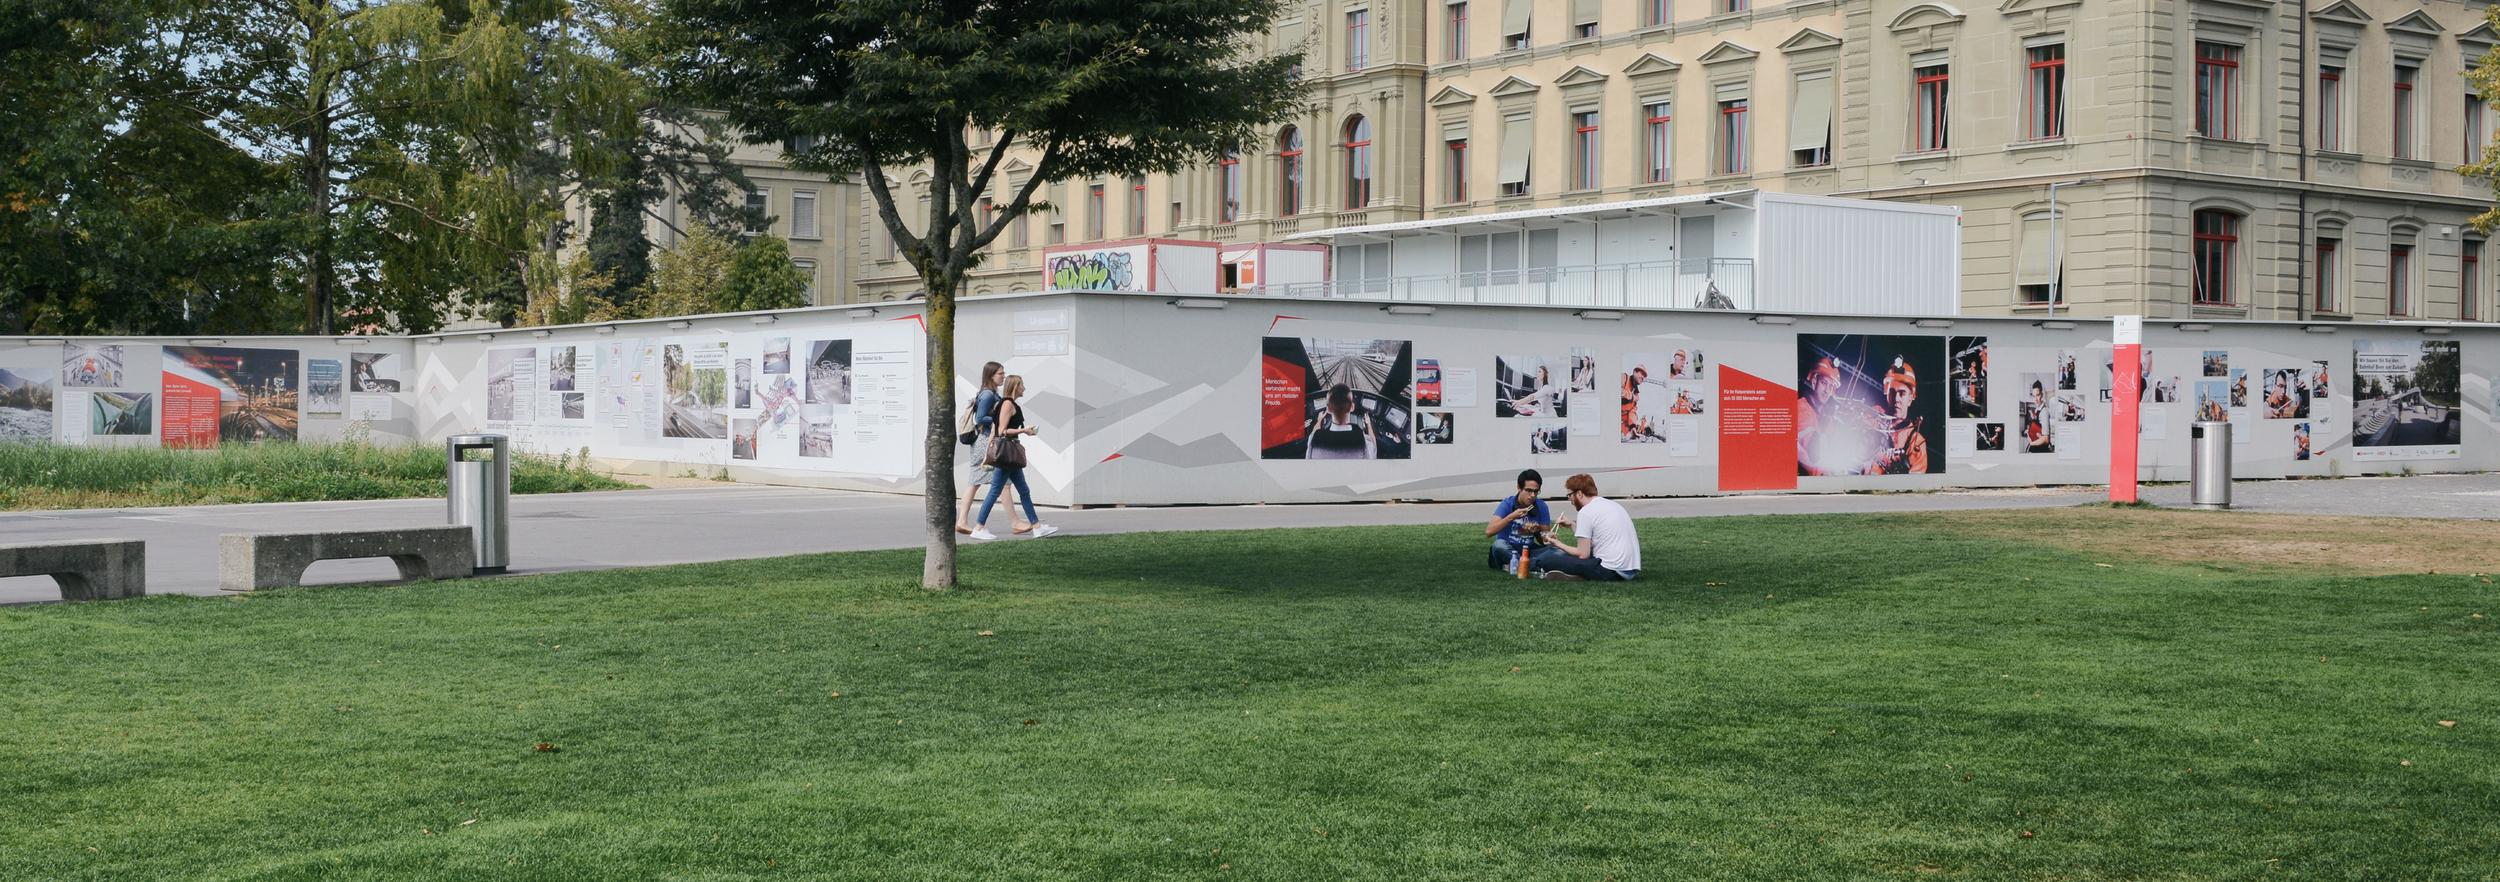 SBB – Gestaltung Bauwand Zukunft Bahnhof Bern